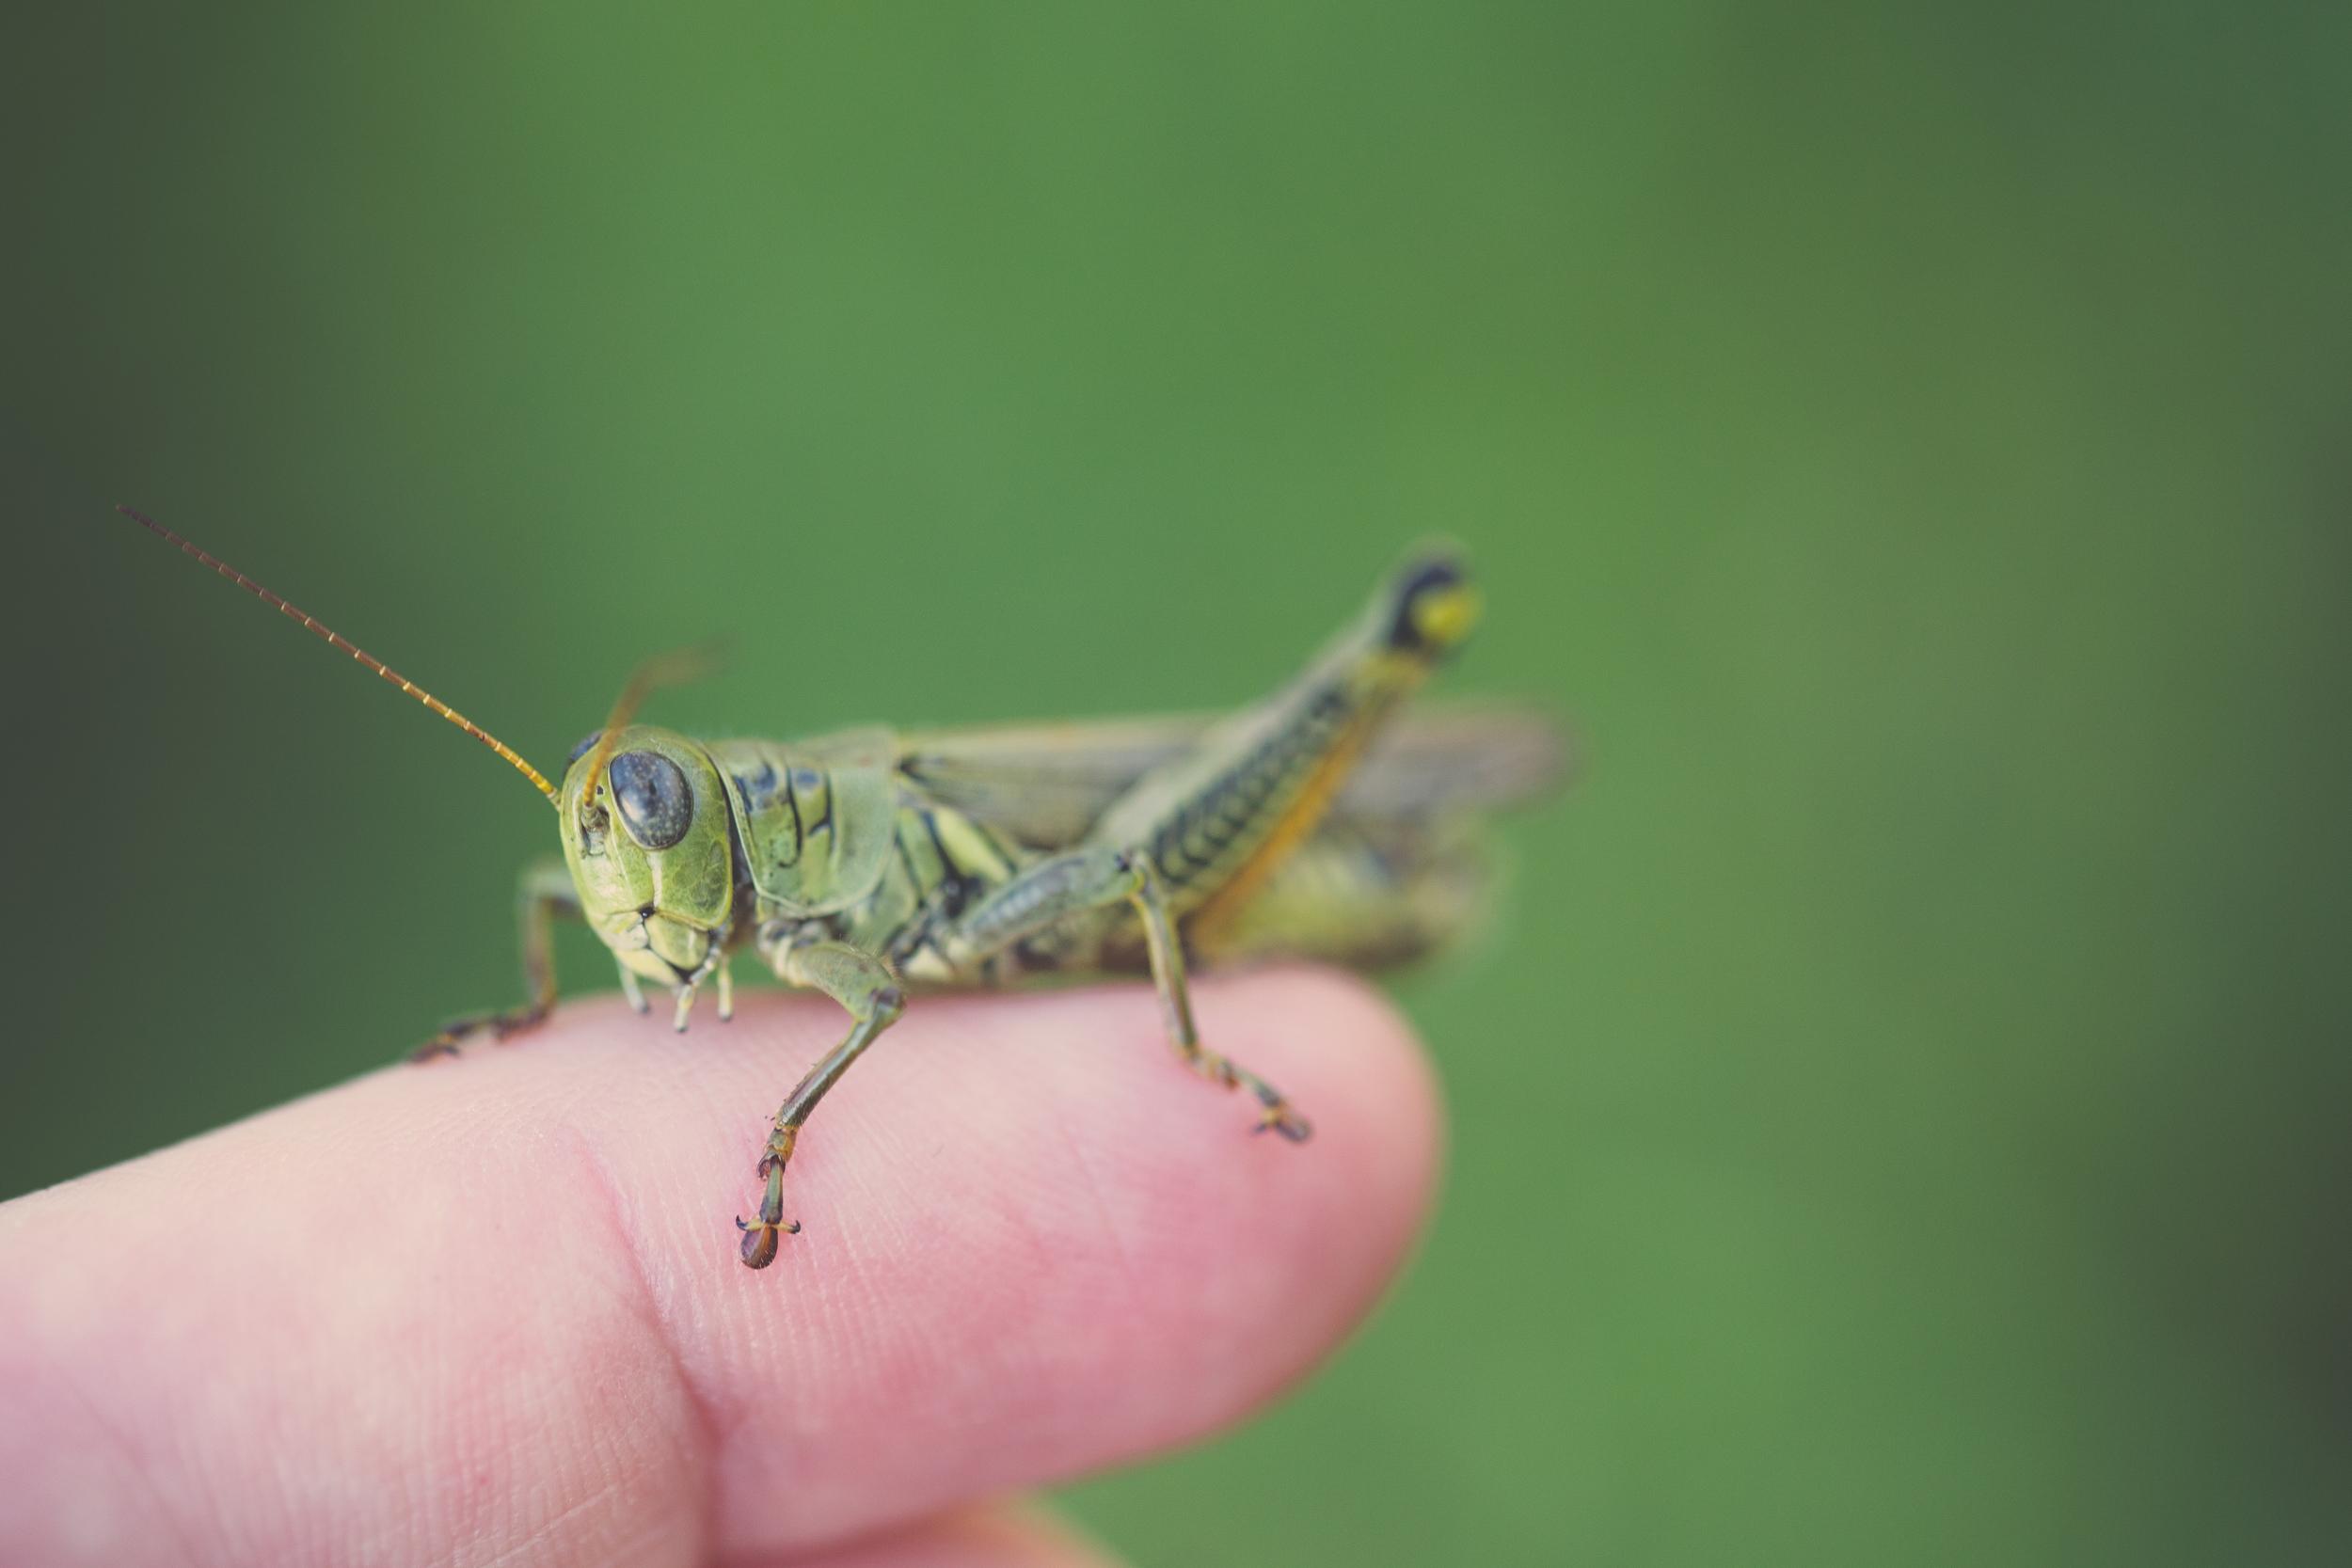 278 // 365 Grasshopper hang out